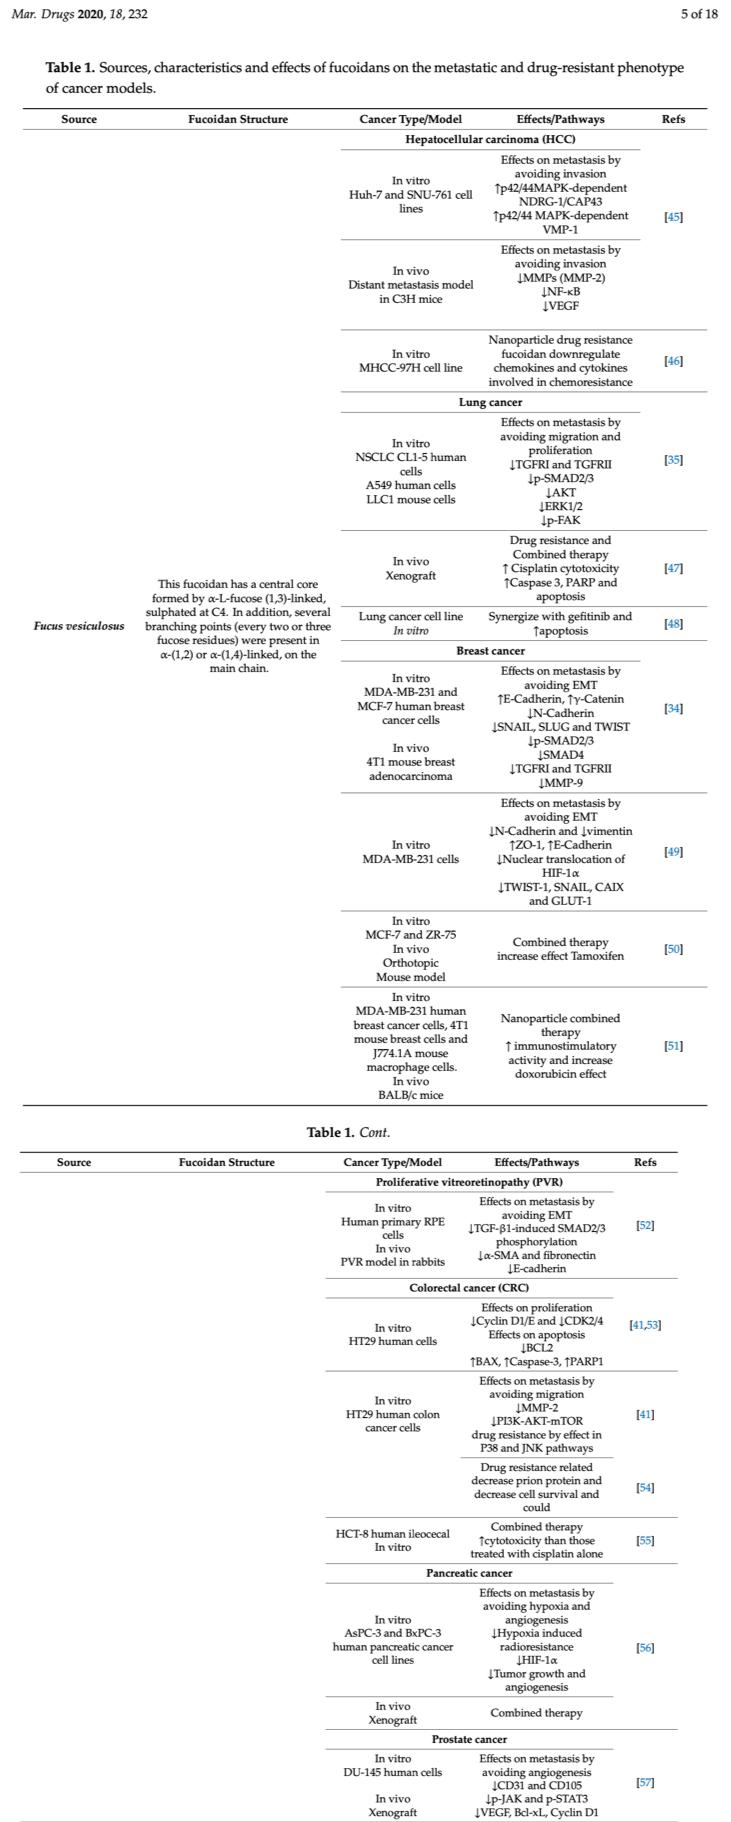 Fucus vesiculosus and anticancer properties via metastasis